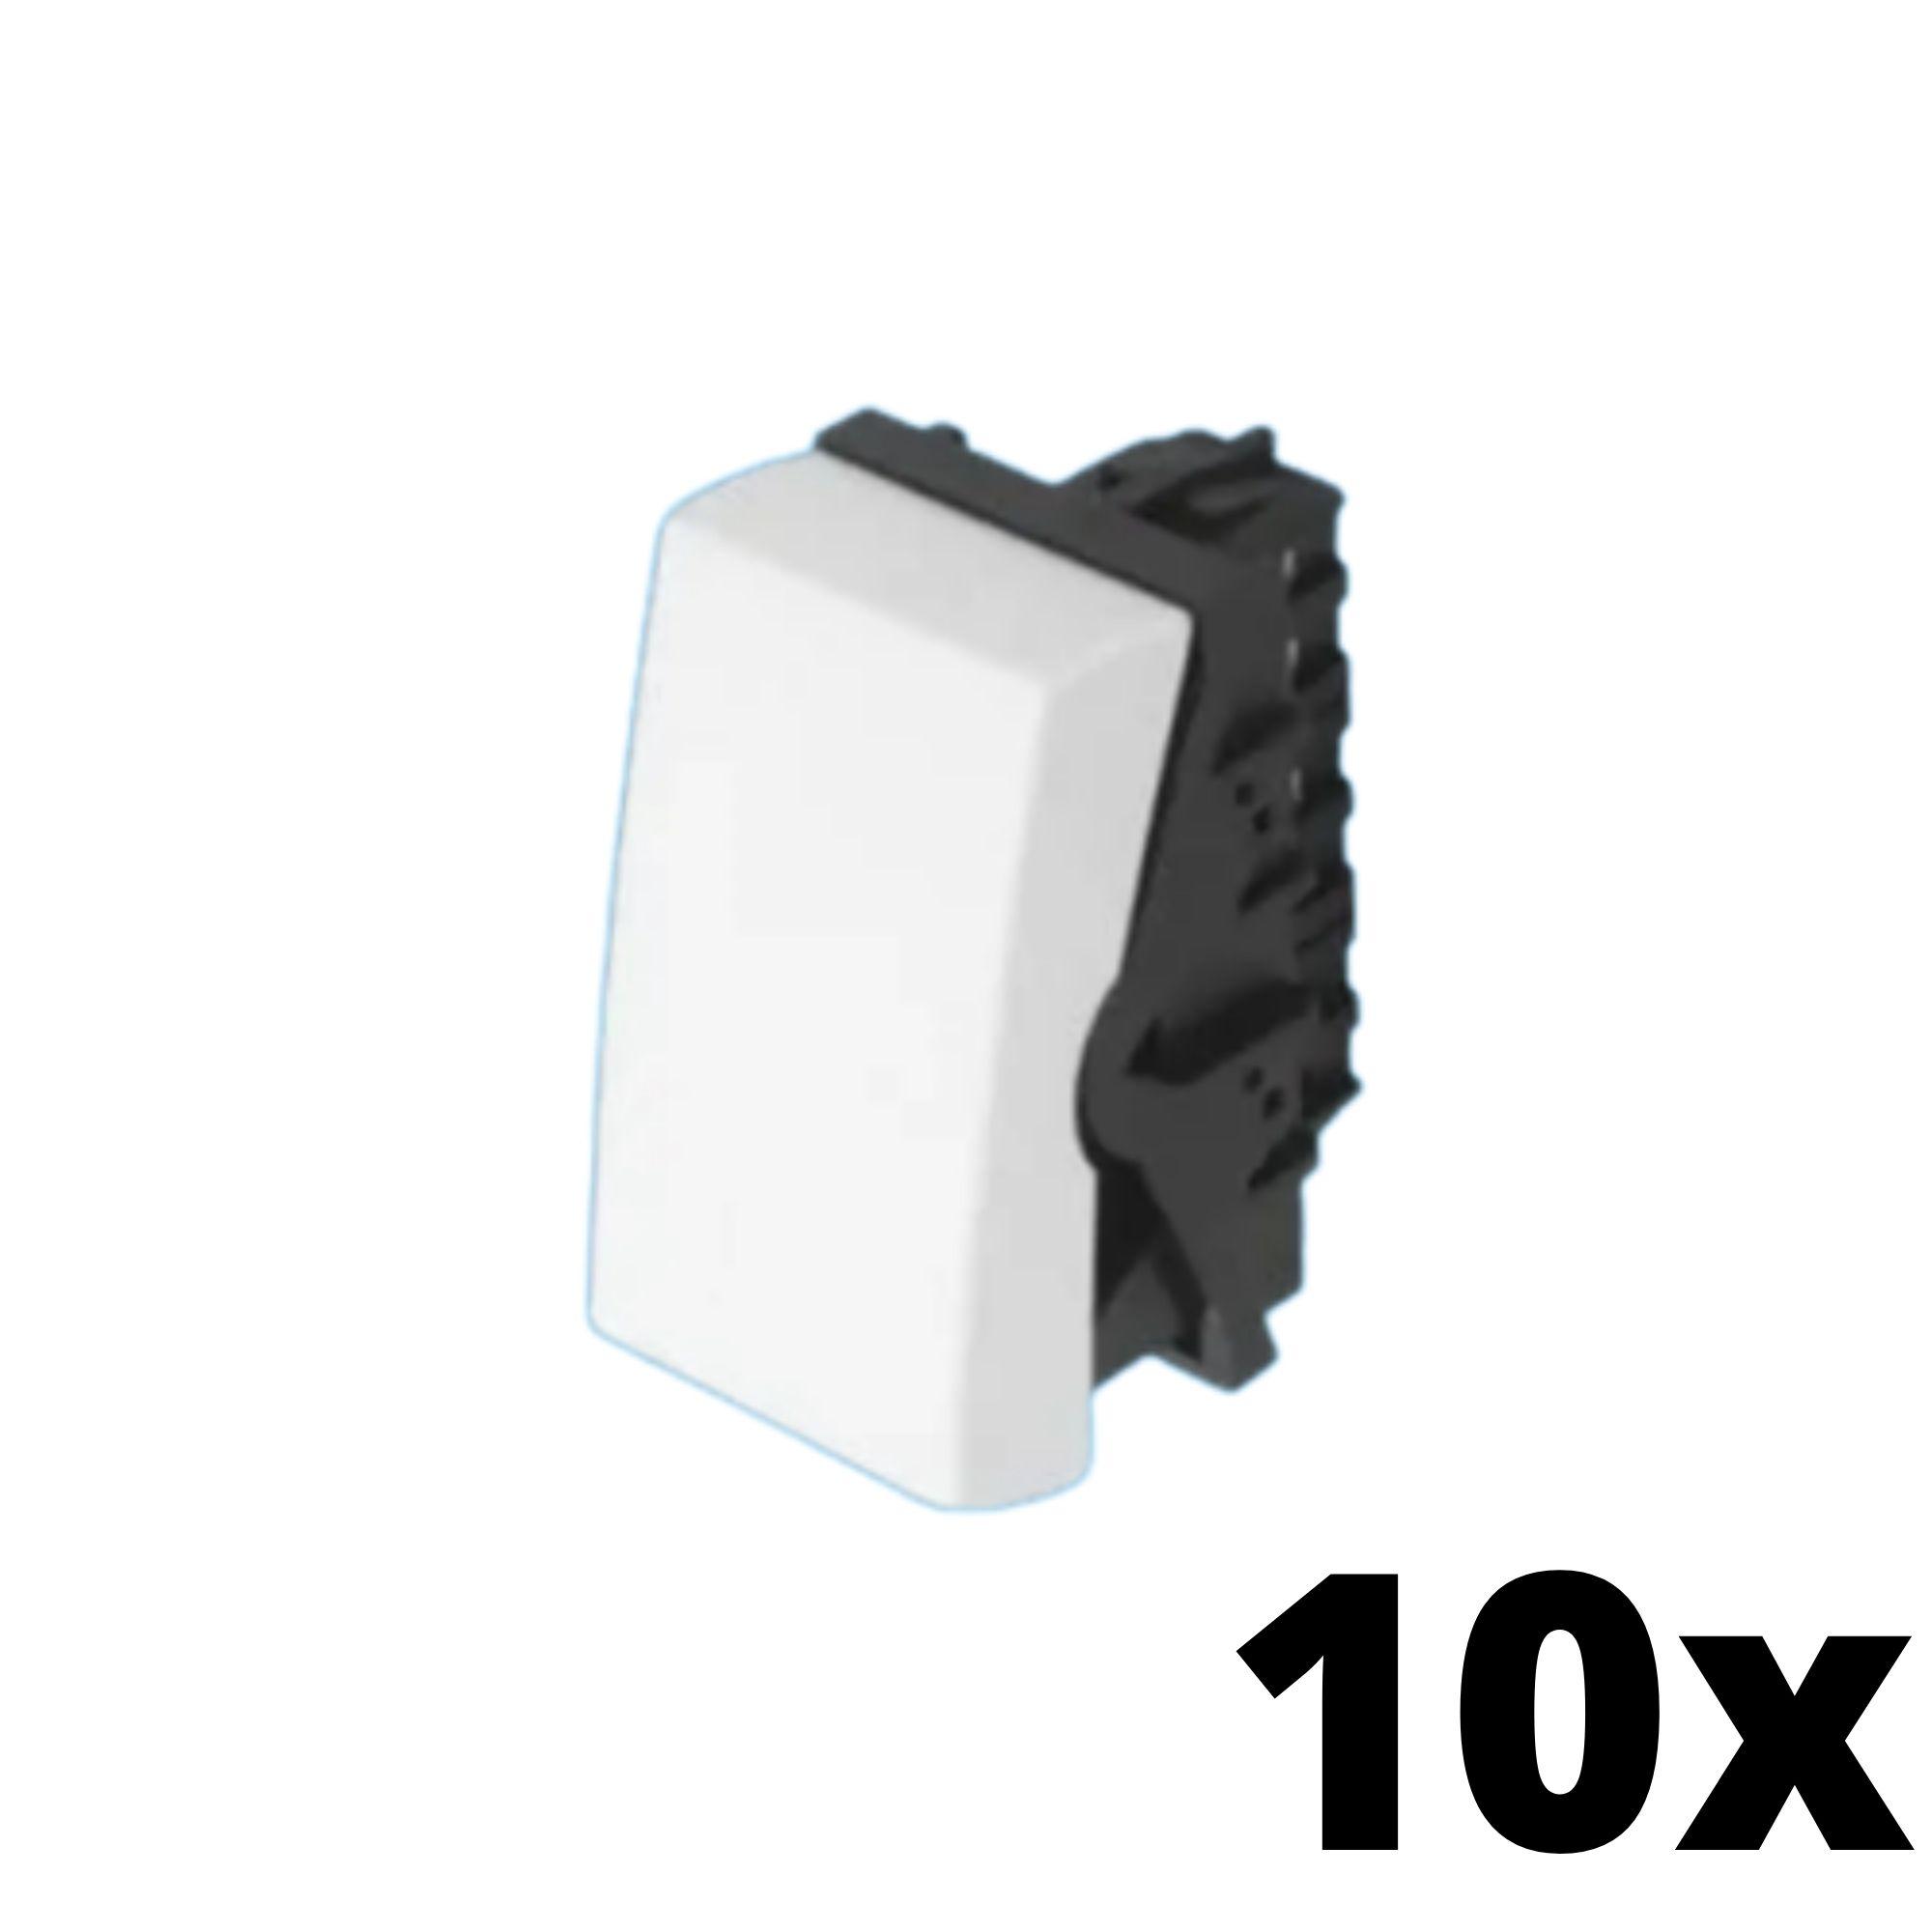 Kit 10 und Evidence Módulo de Interruptor Intermediário